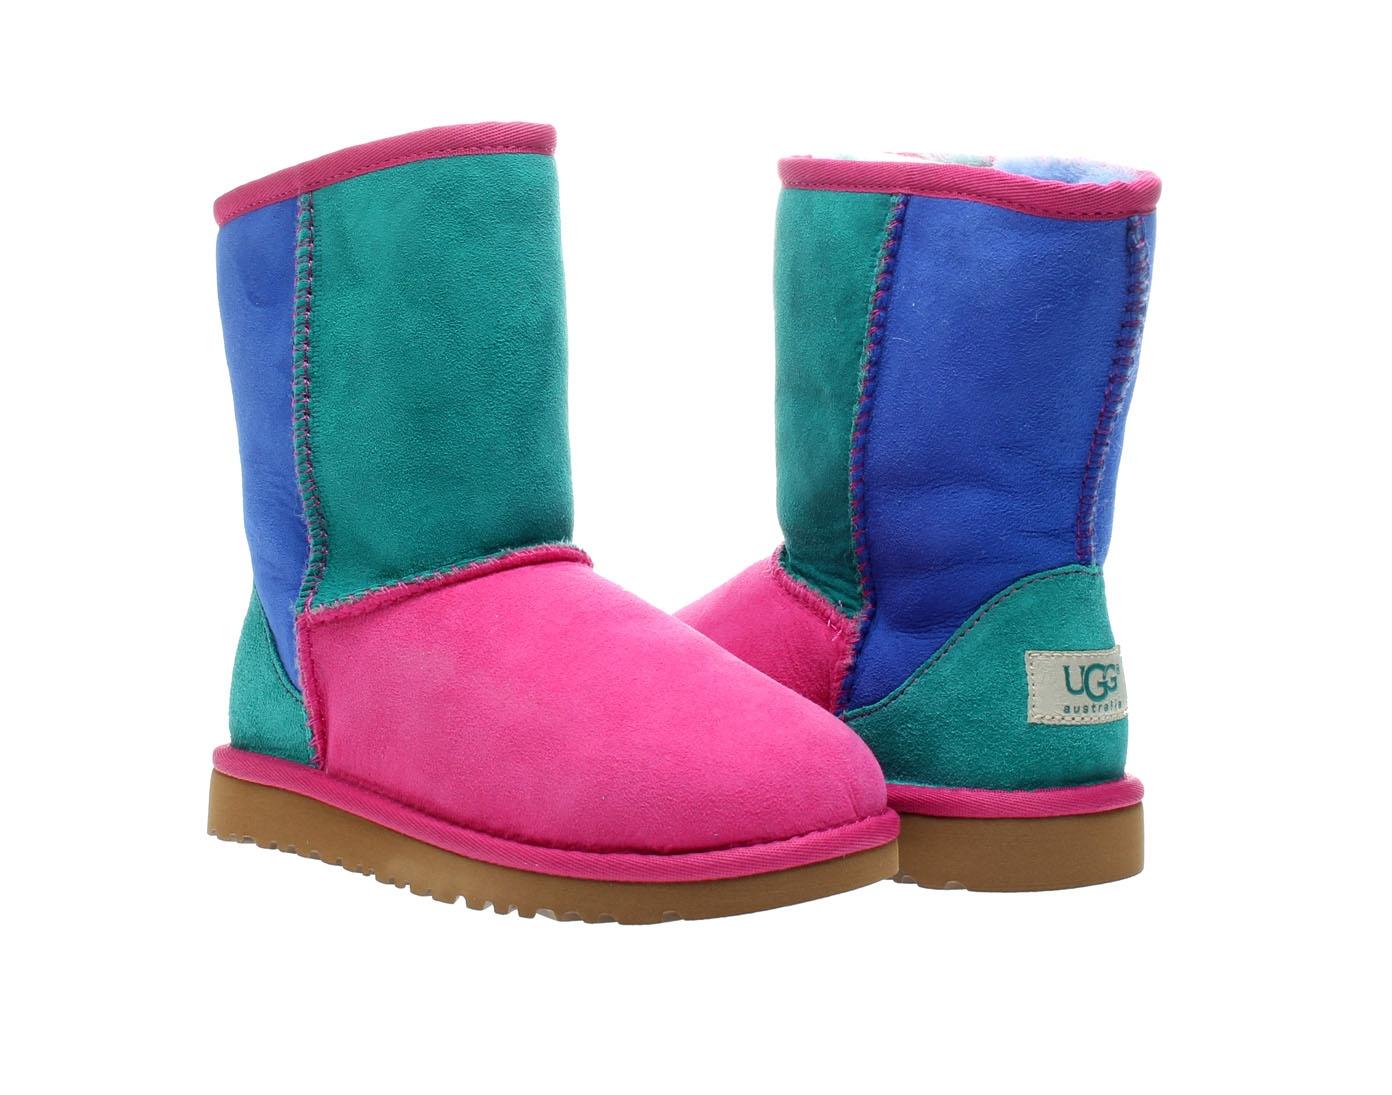 Cute Ugg Like Boots Wwwnanomat Mastereu